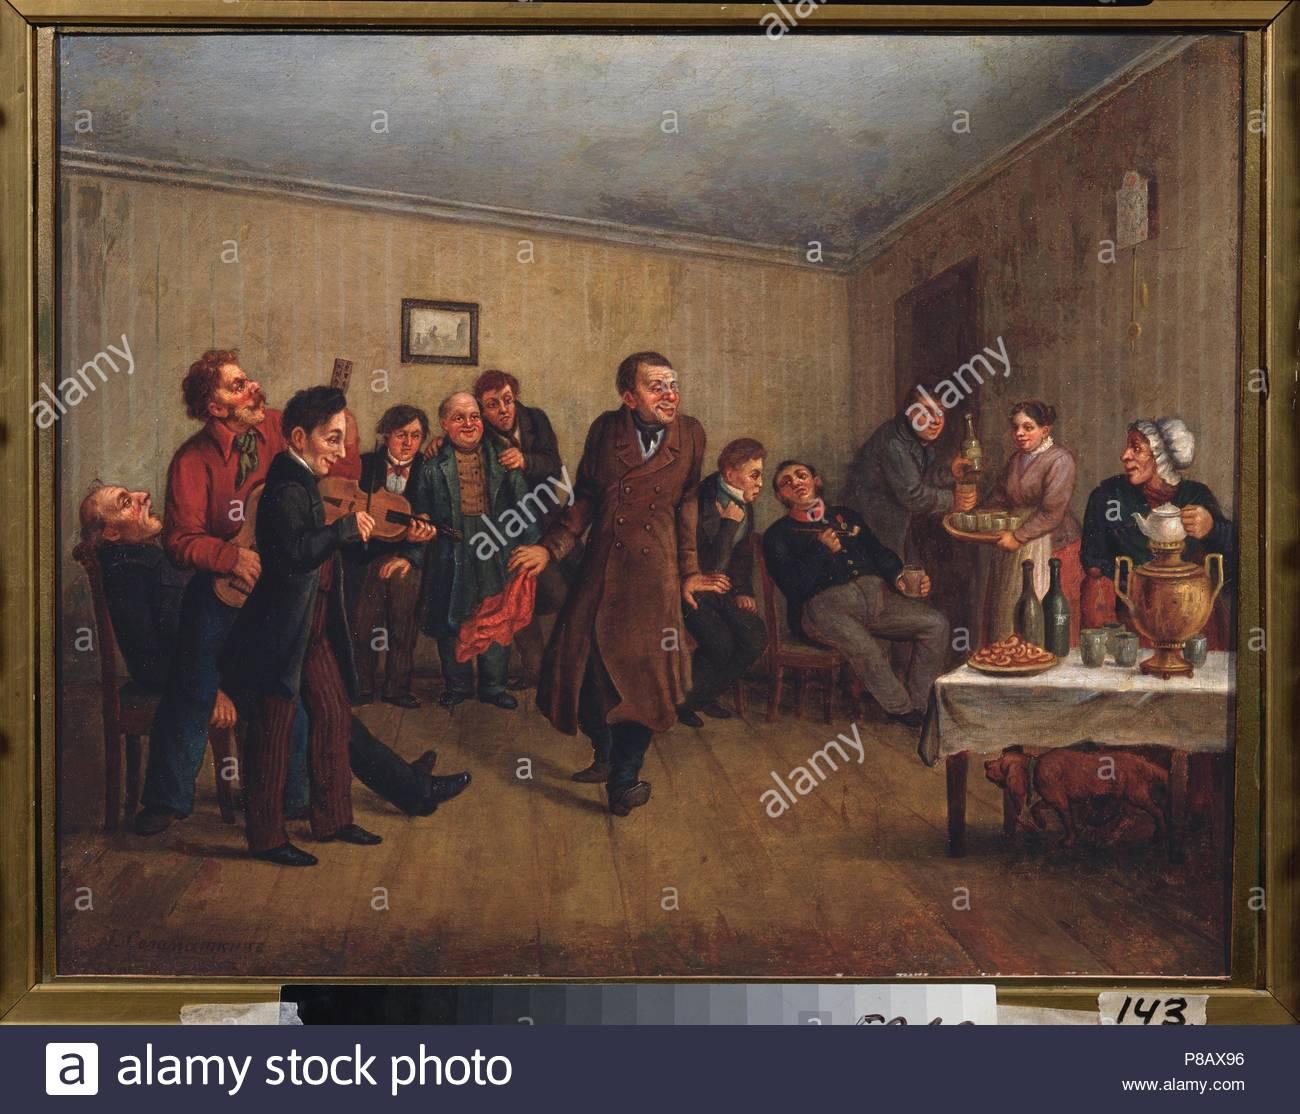 A Merchant's Evening Party. Museum: Regional Art Gallery, Volgograd. - Stock Image